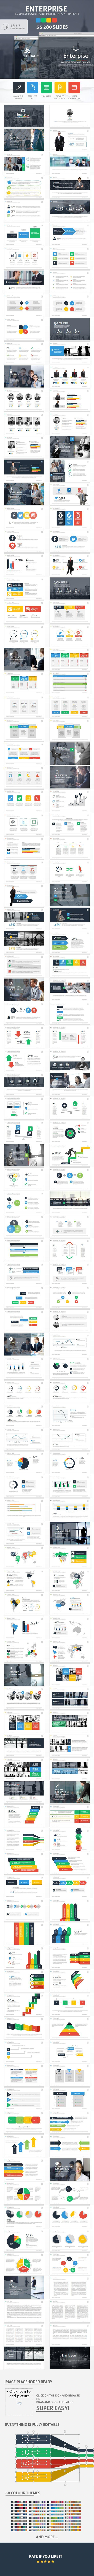 Enterprise Powerpoint Presentation Template #design #slides Download: http://graphicriver.net/item/enterprise-powerpoint-presentation-template/13406379?ref=ksioks